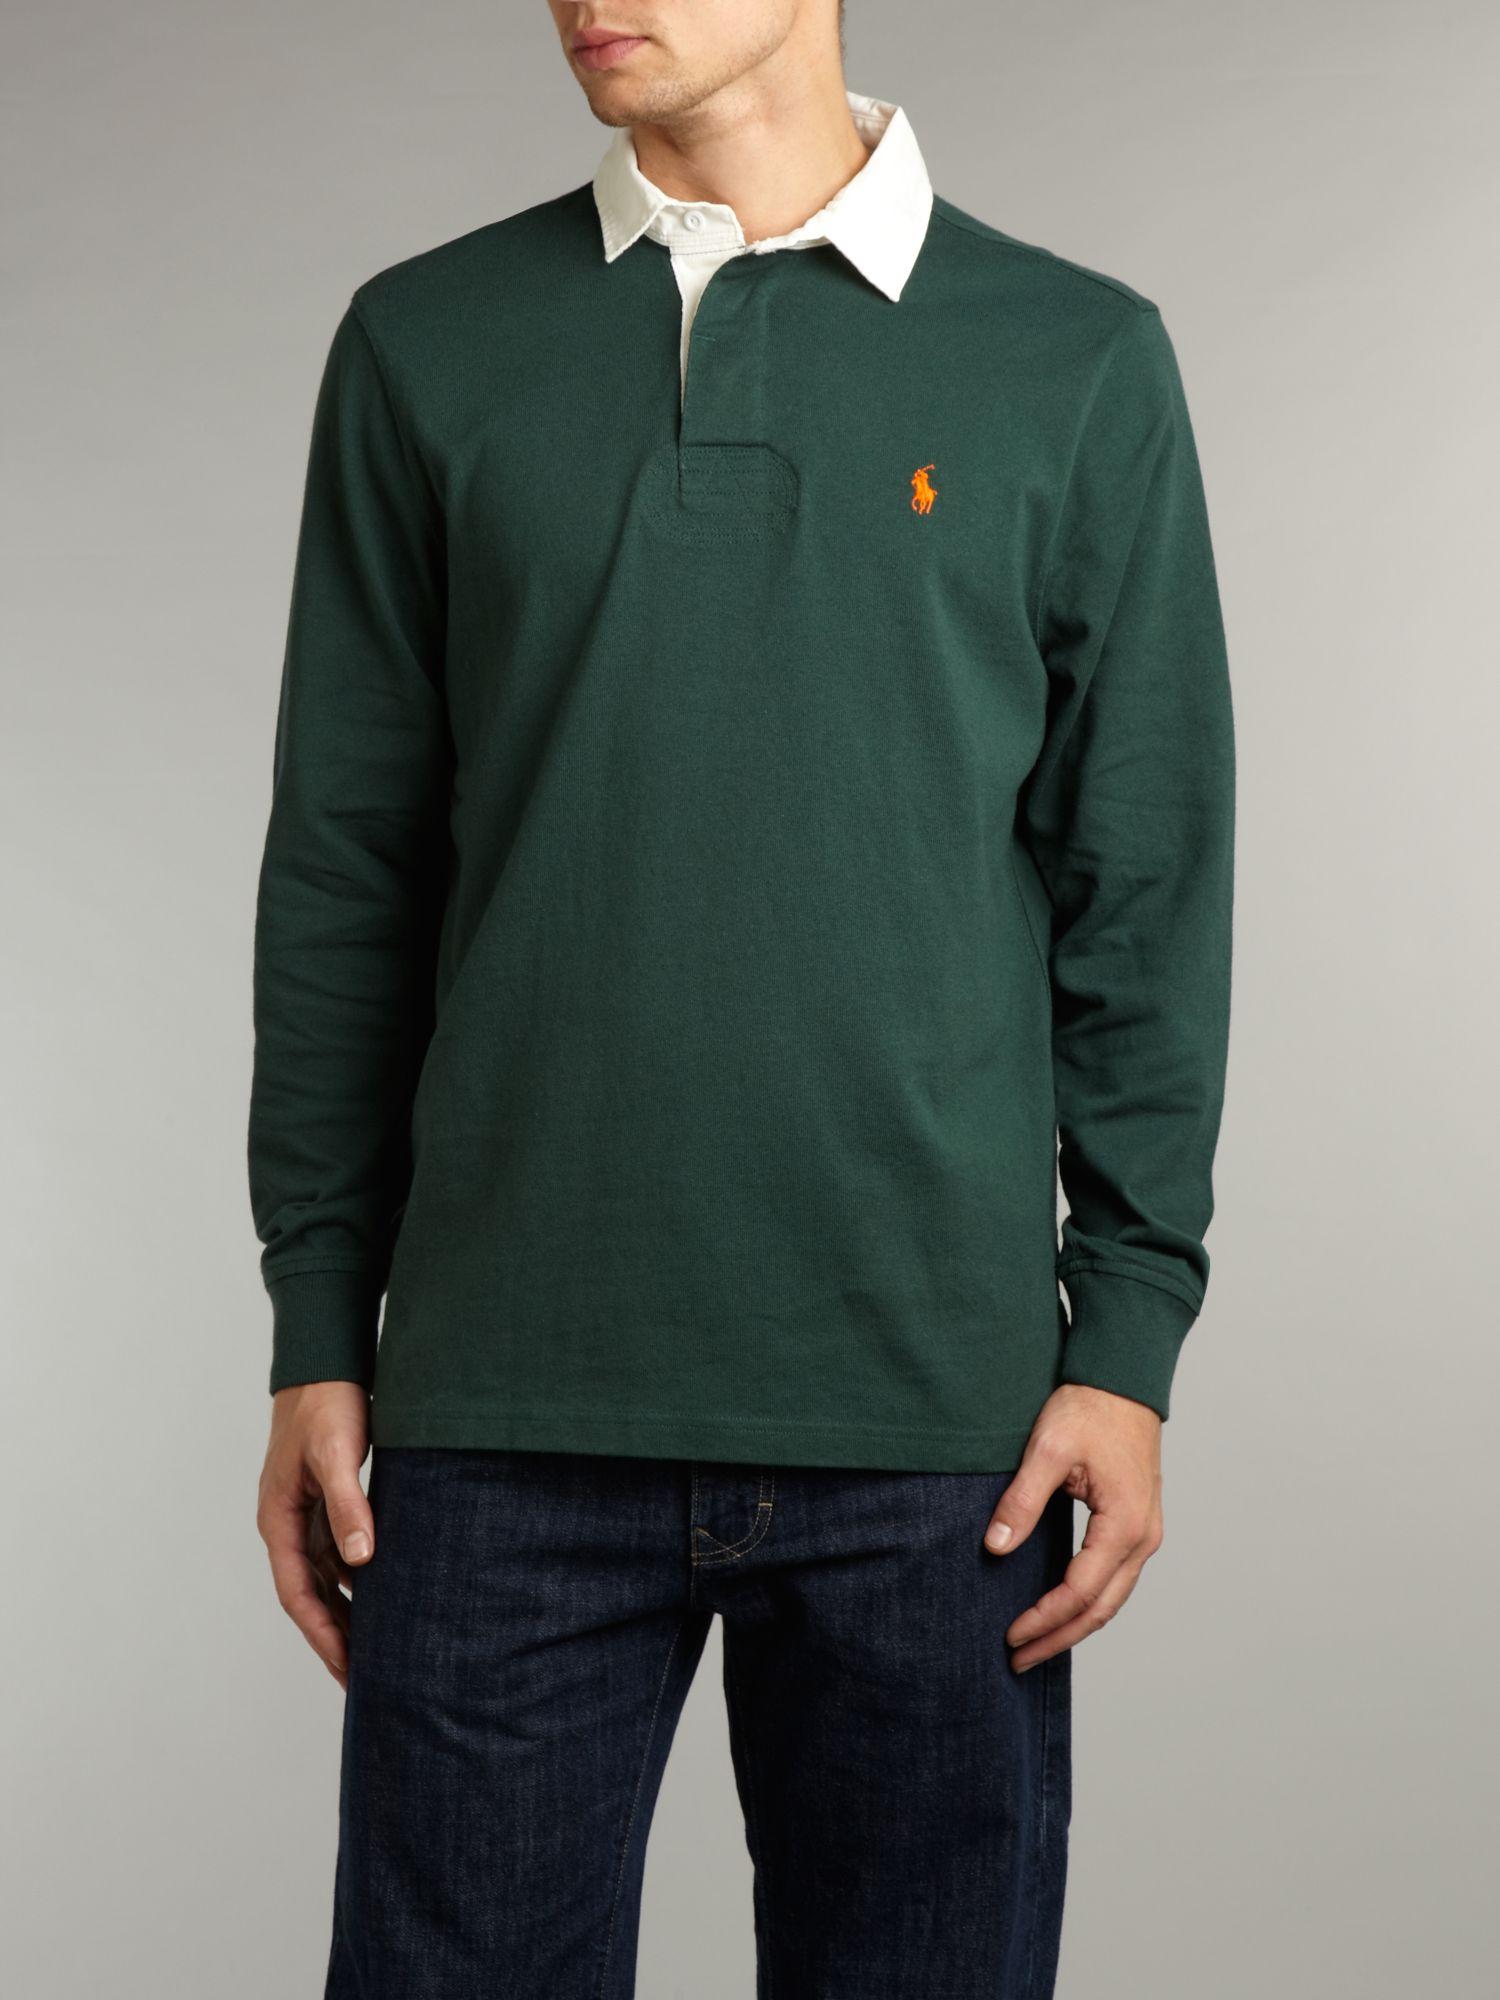 Ralph Lauren Long Sleeved Green Mesh Polo Men